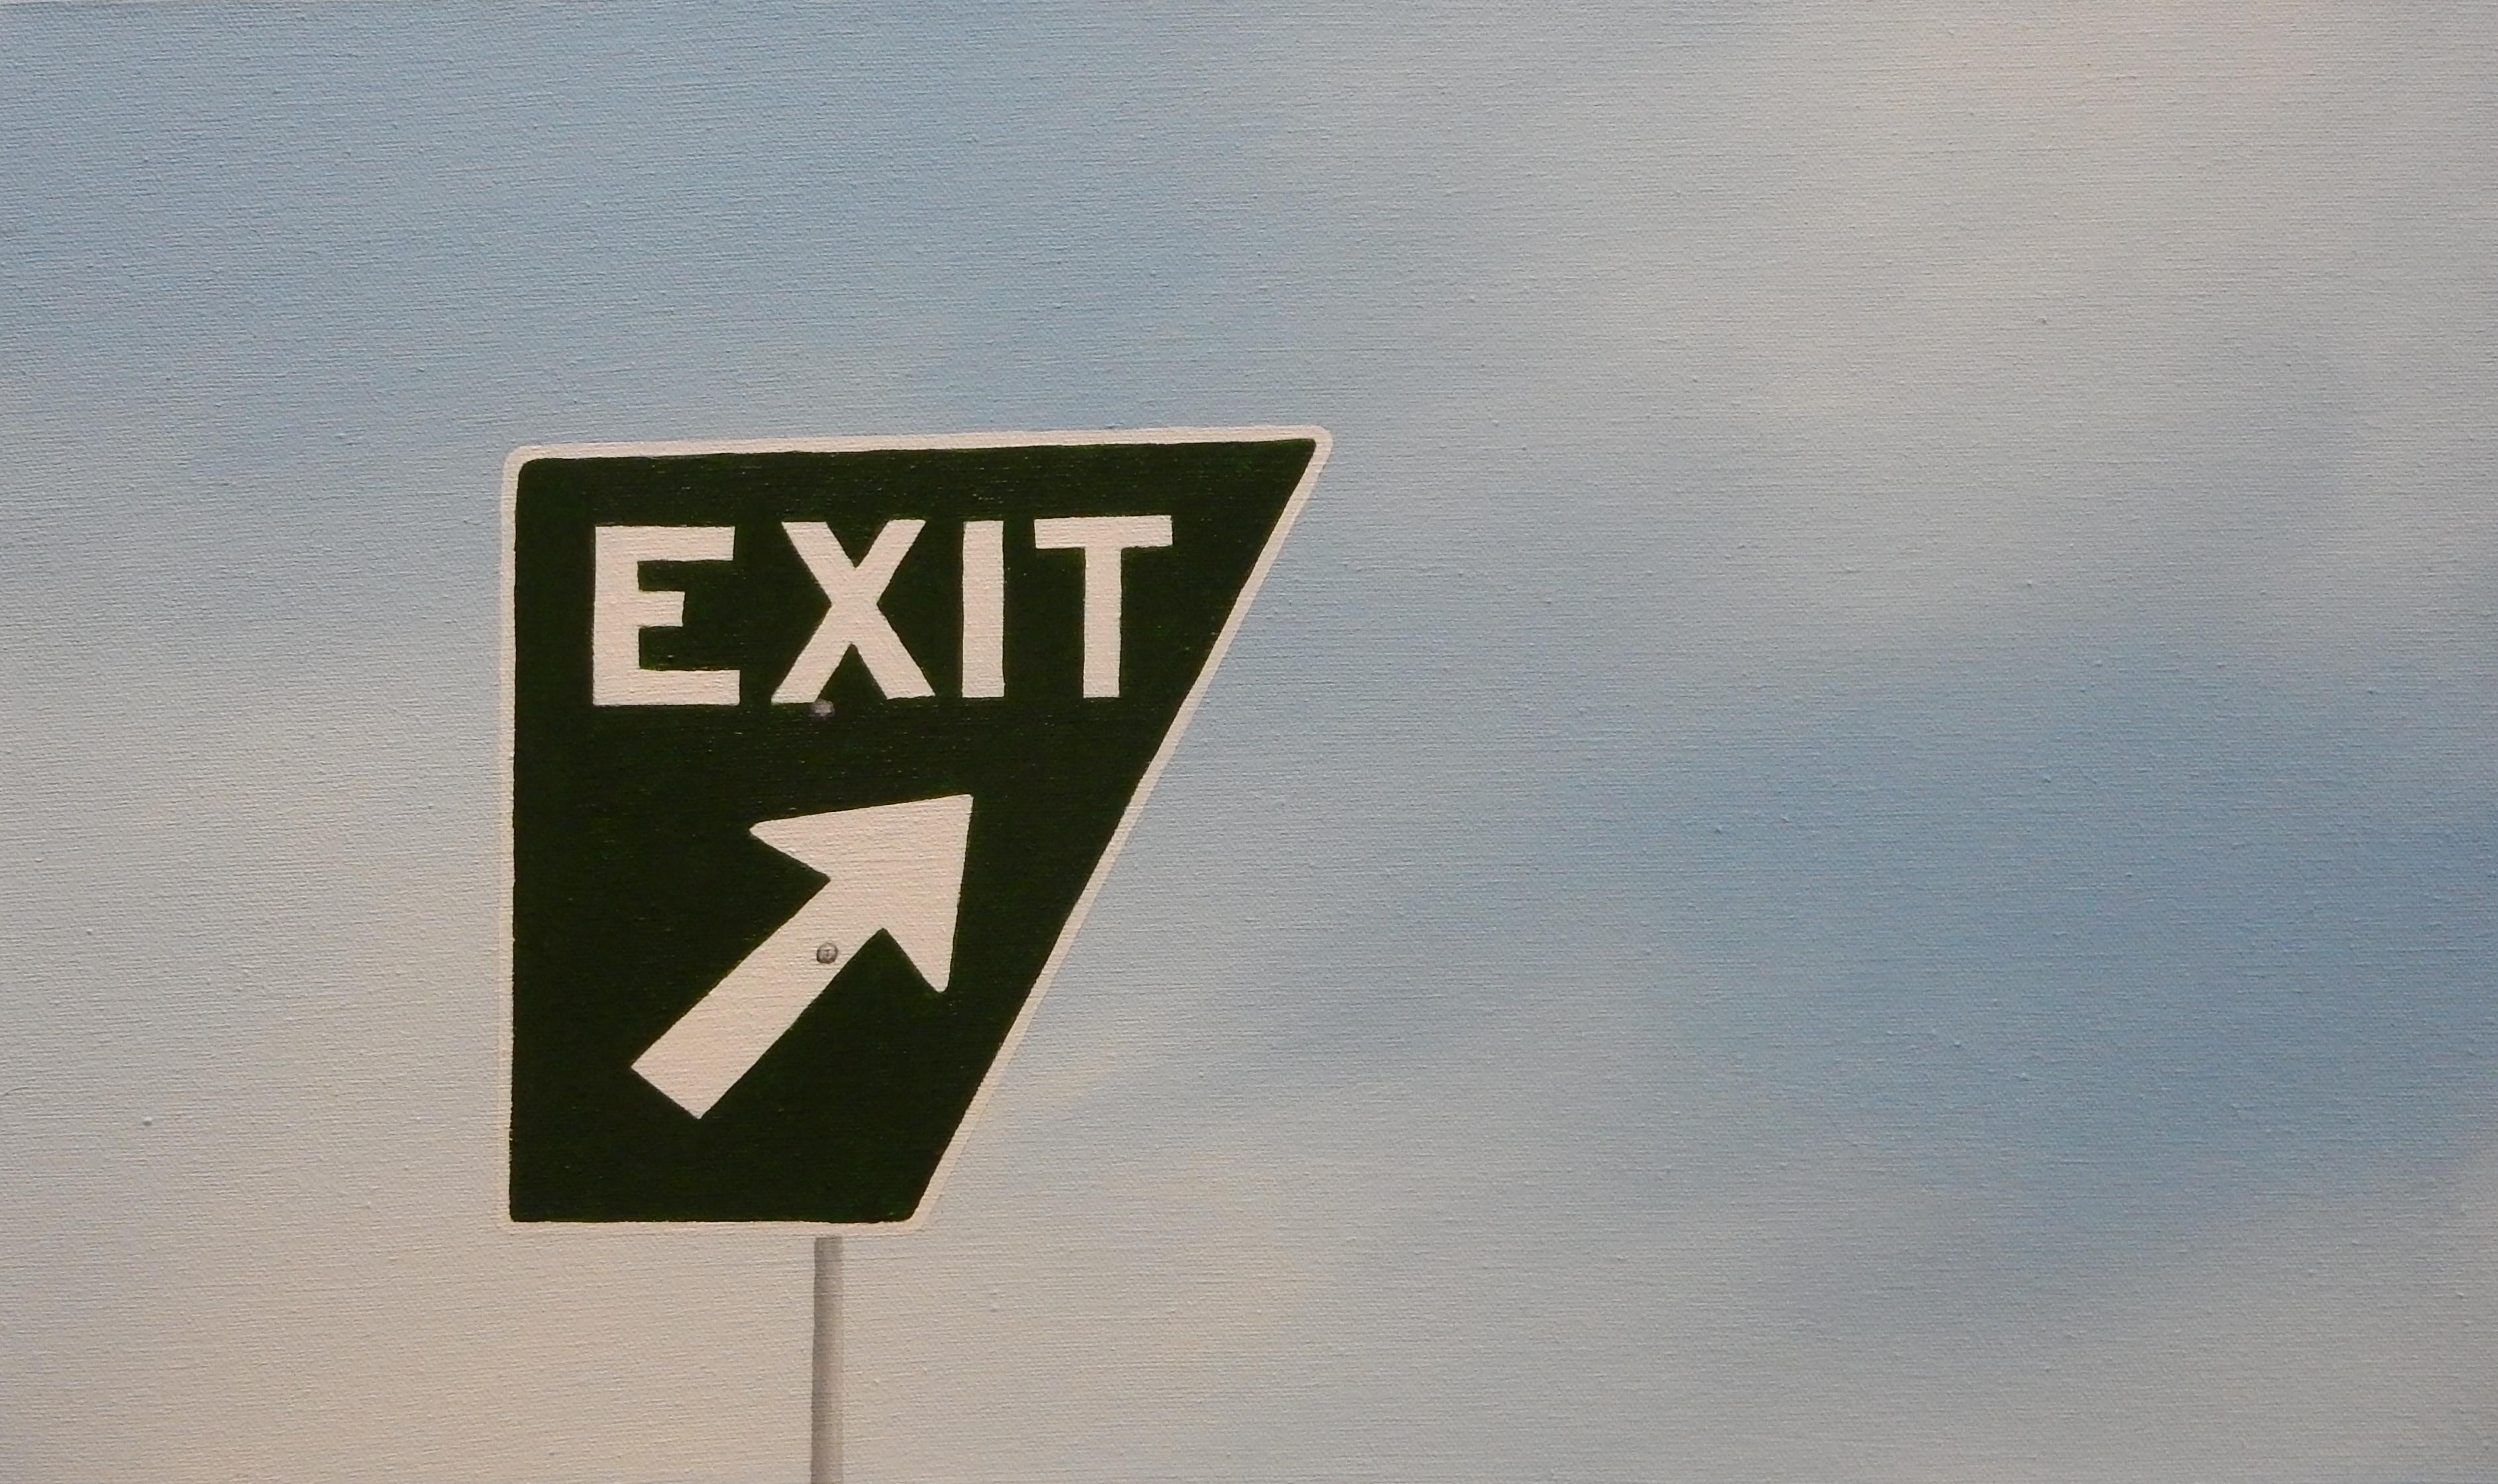 Exit #2